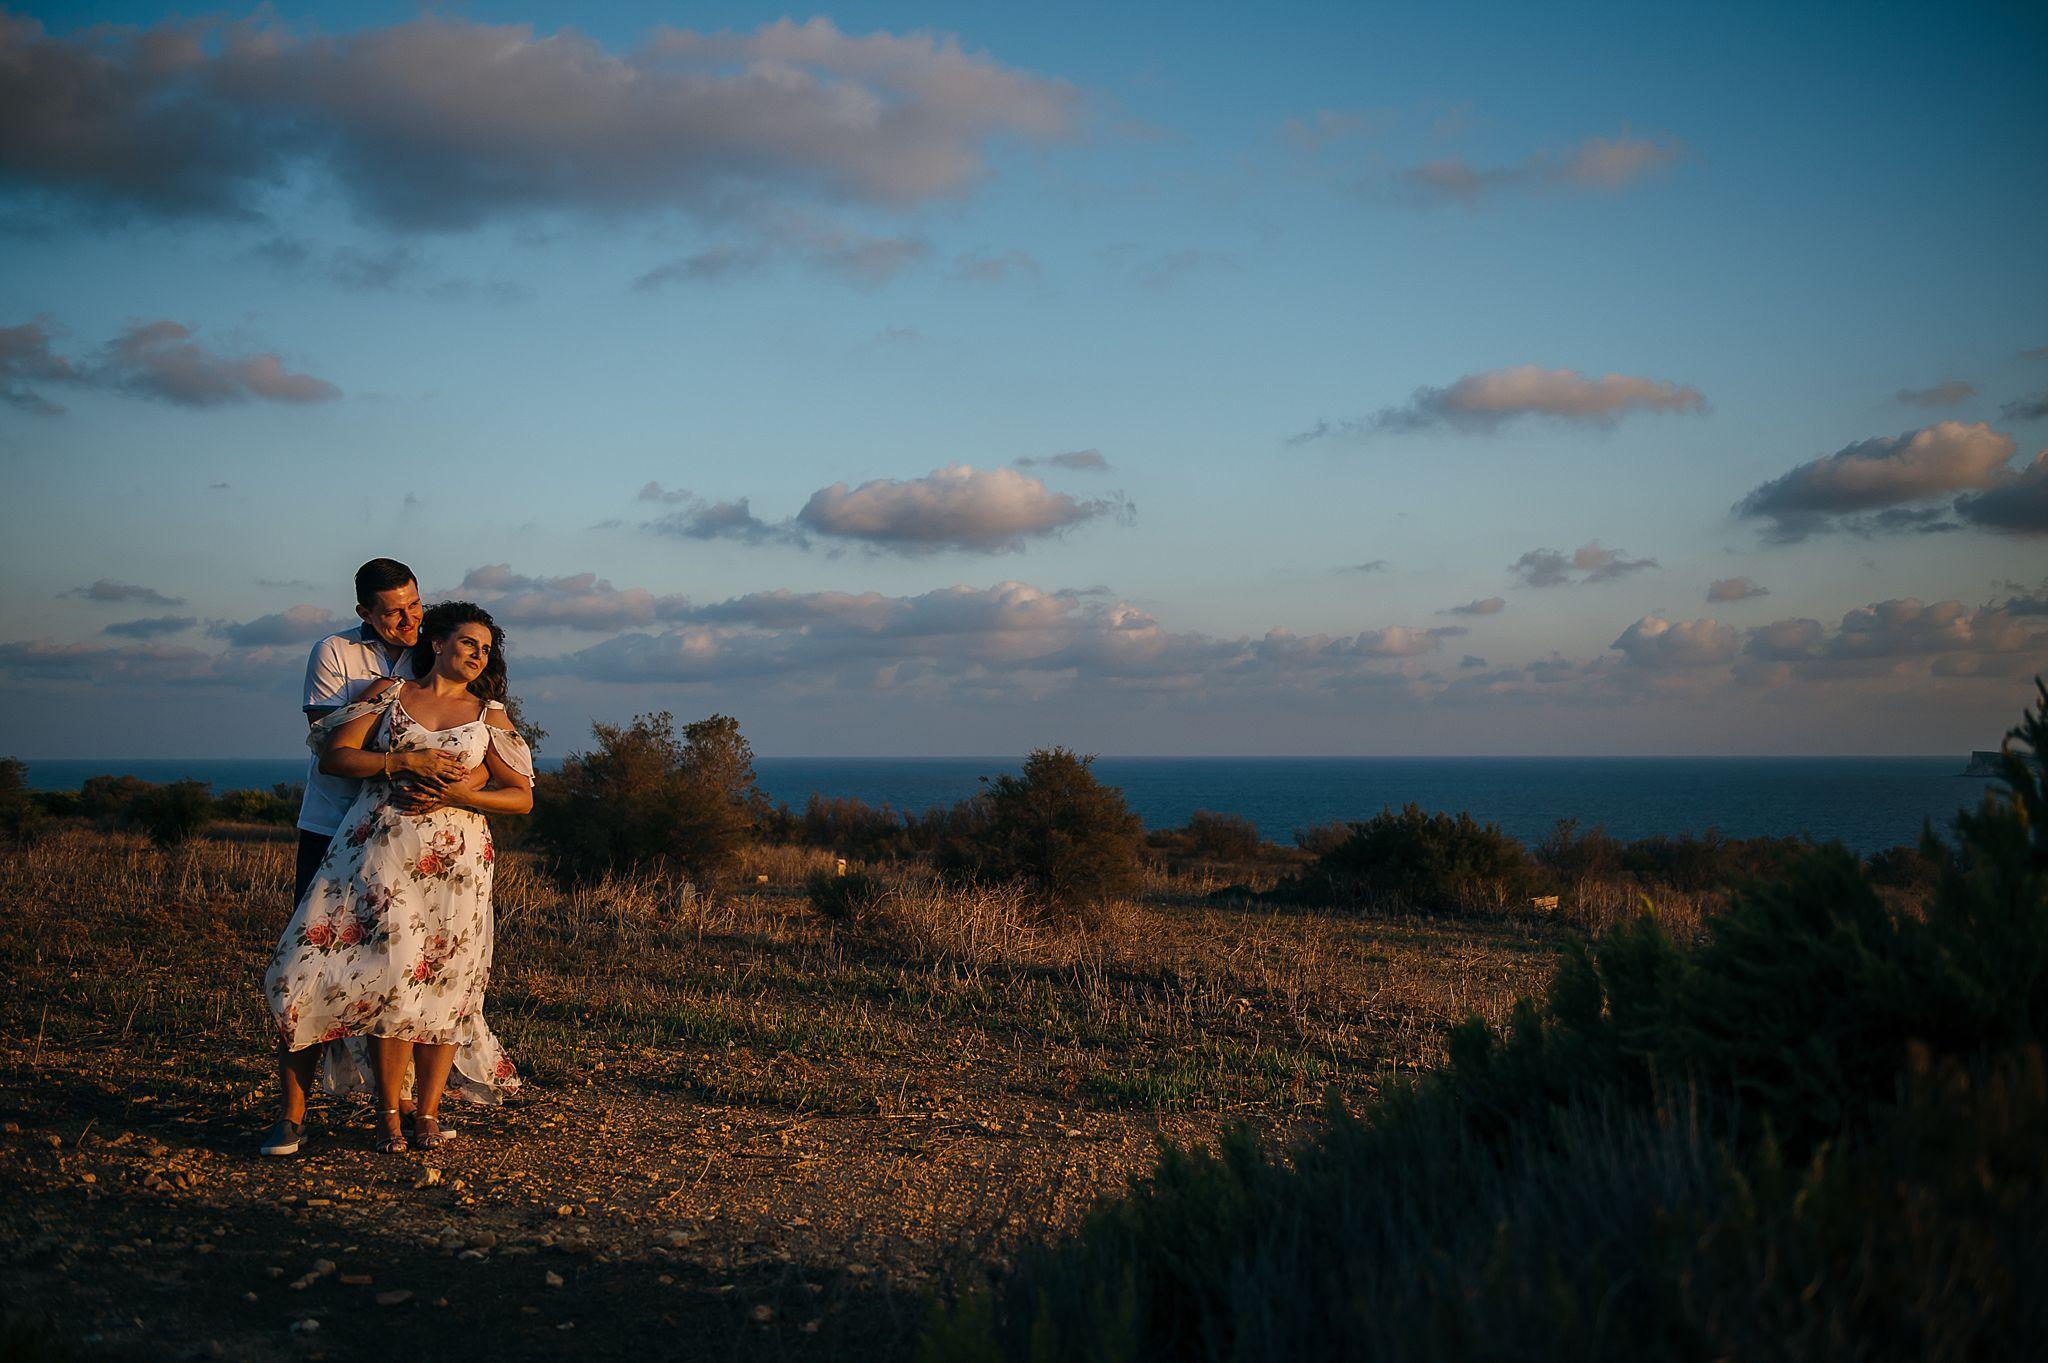 Stephanie & Paul | Anniversary Photoshoot - Malta | Shane P. Watts Photography